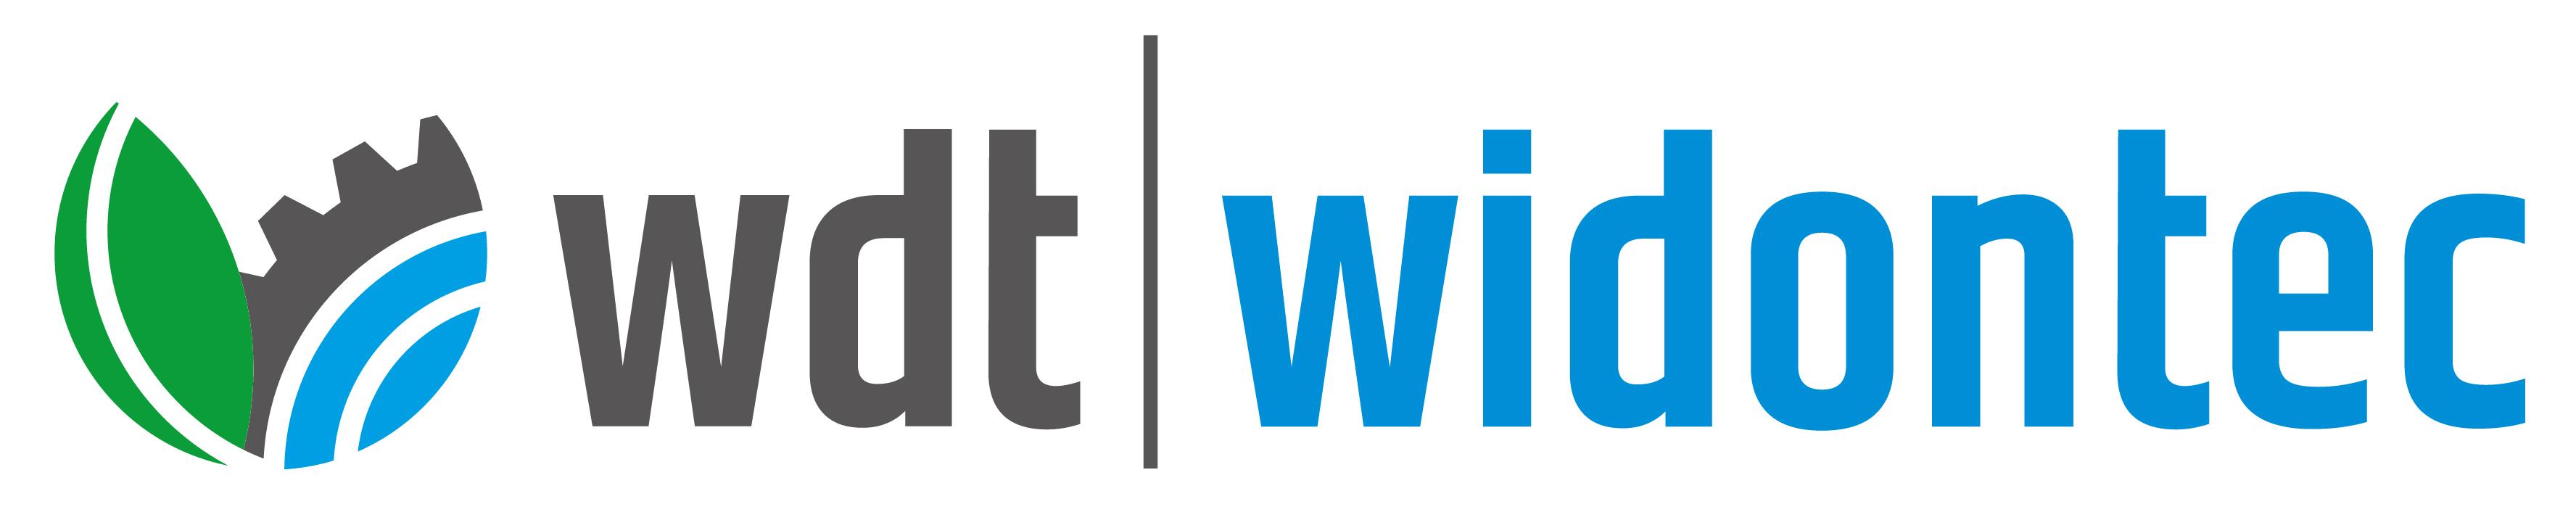 Widontec | We improve technics